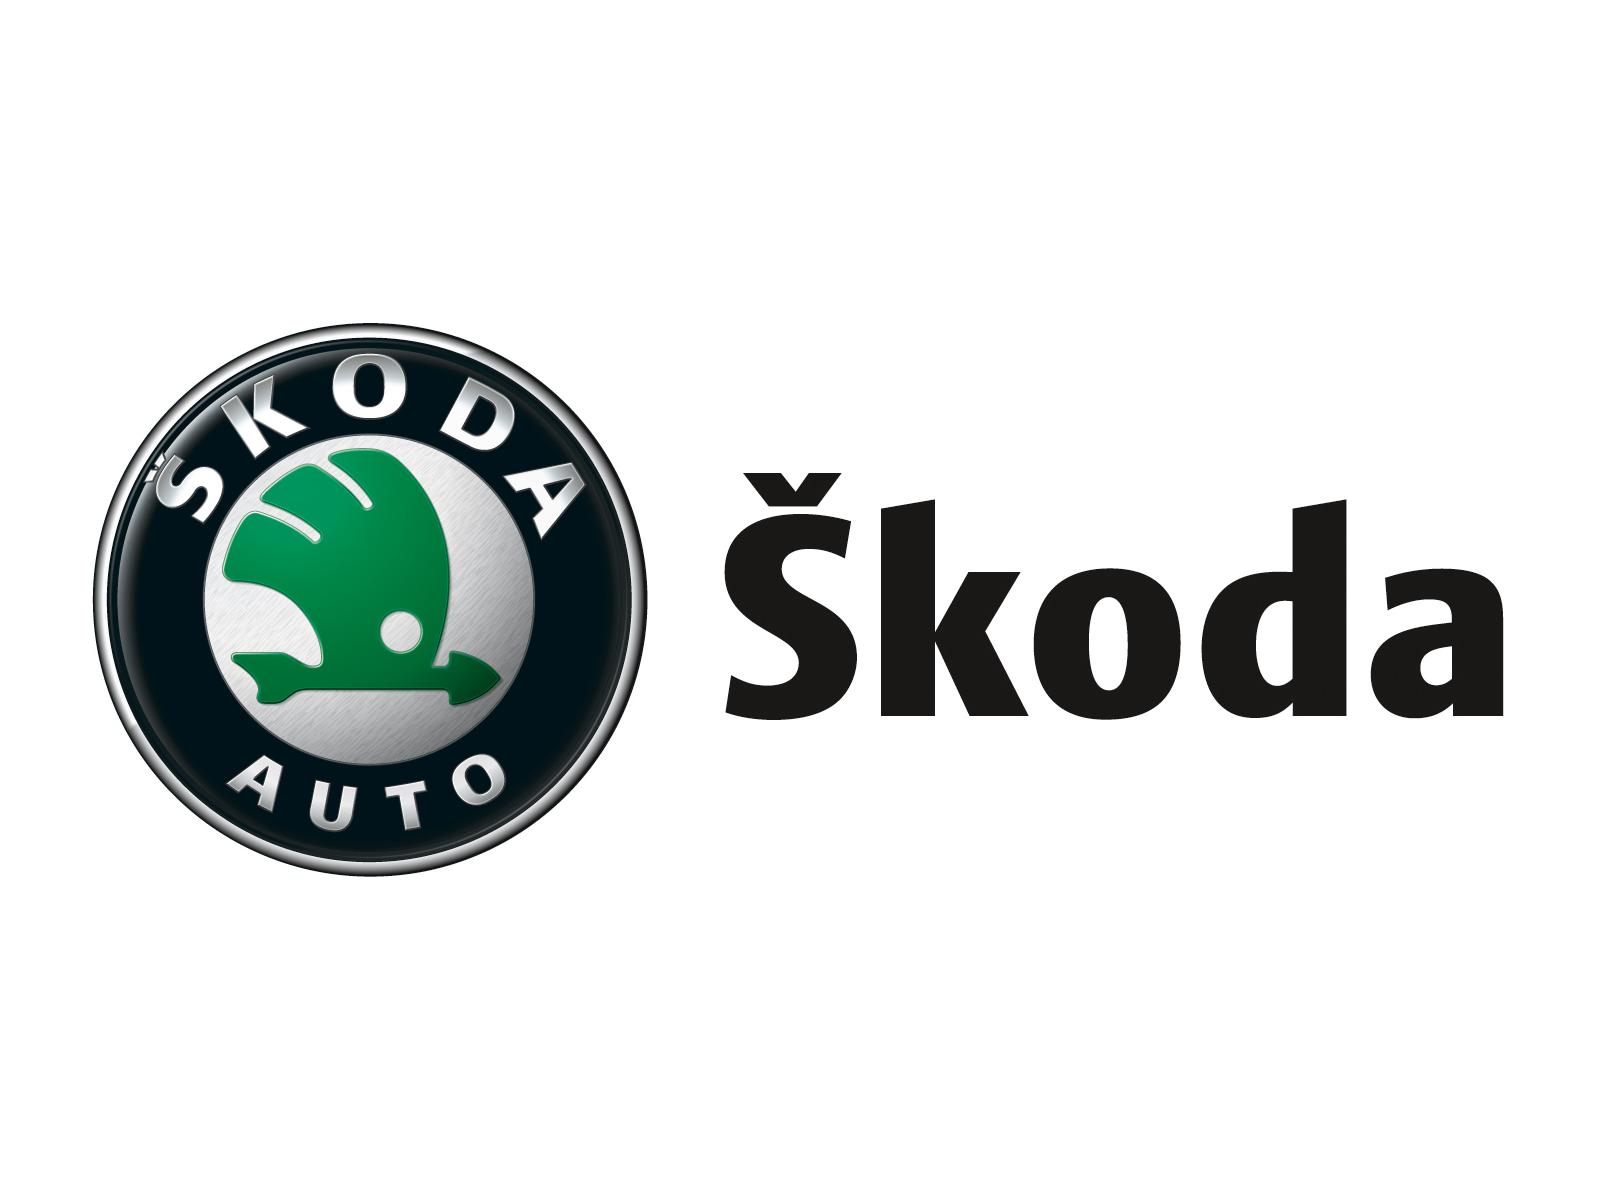 Skoda HD PNG - 117563